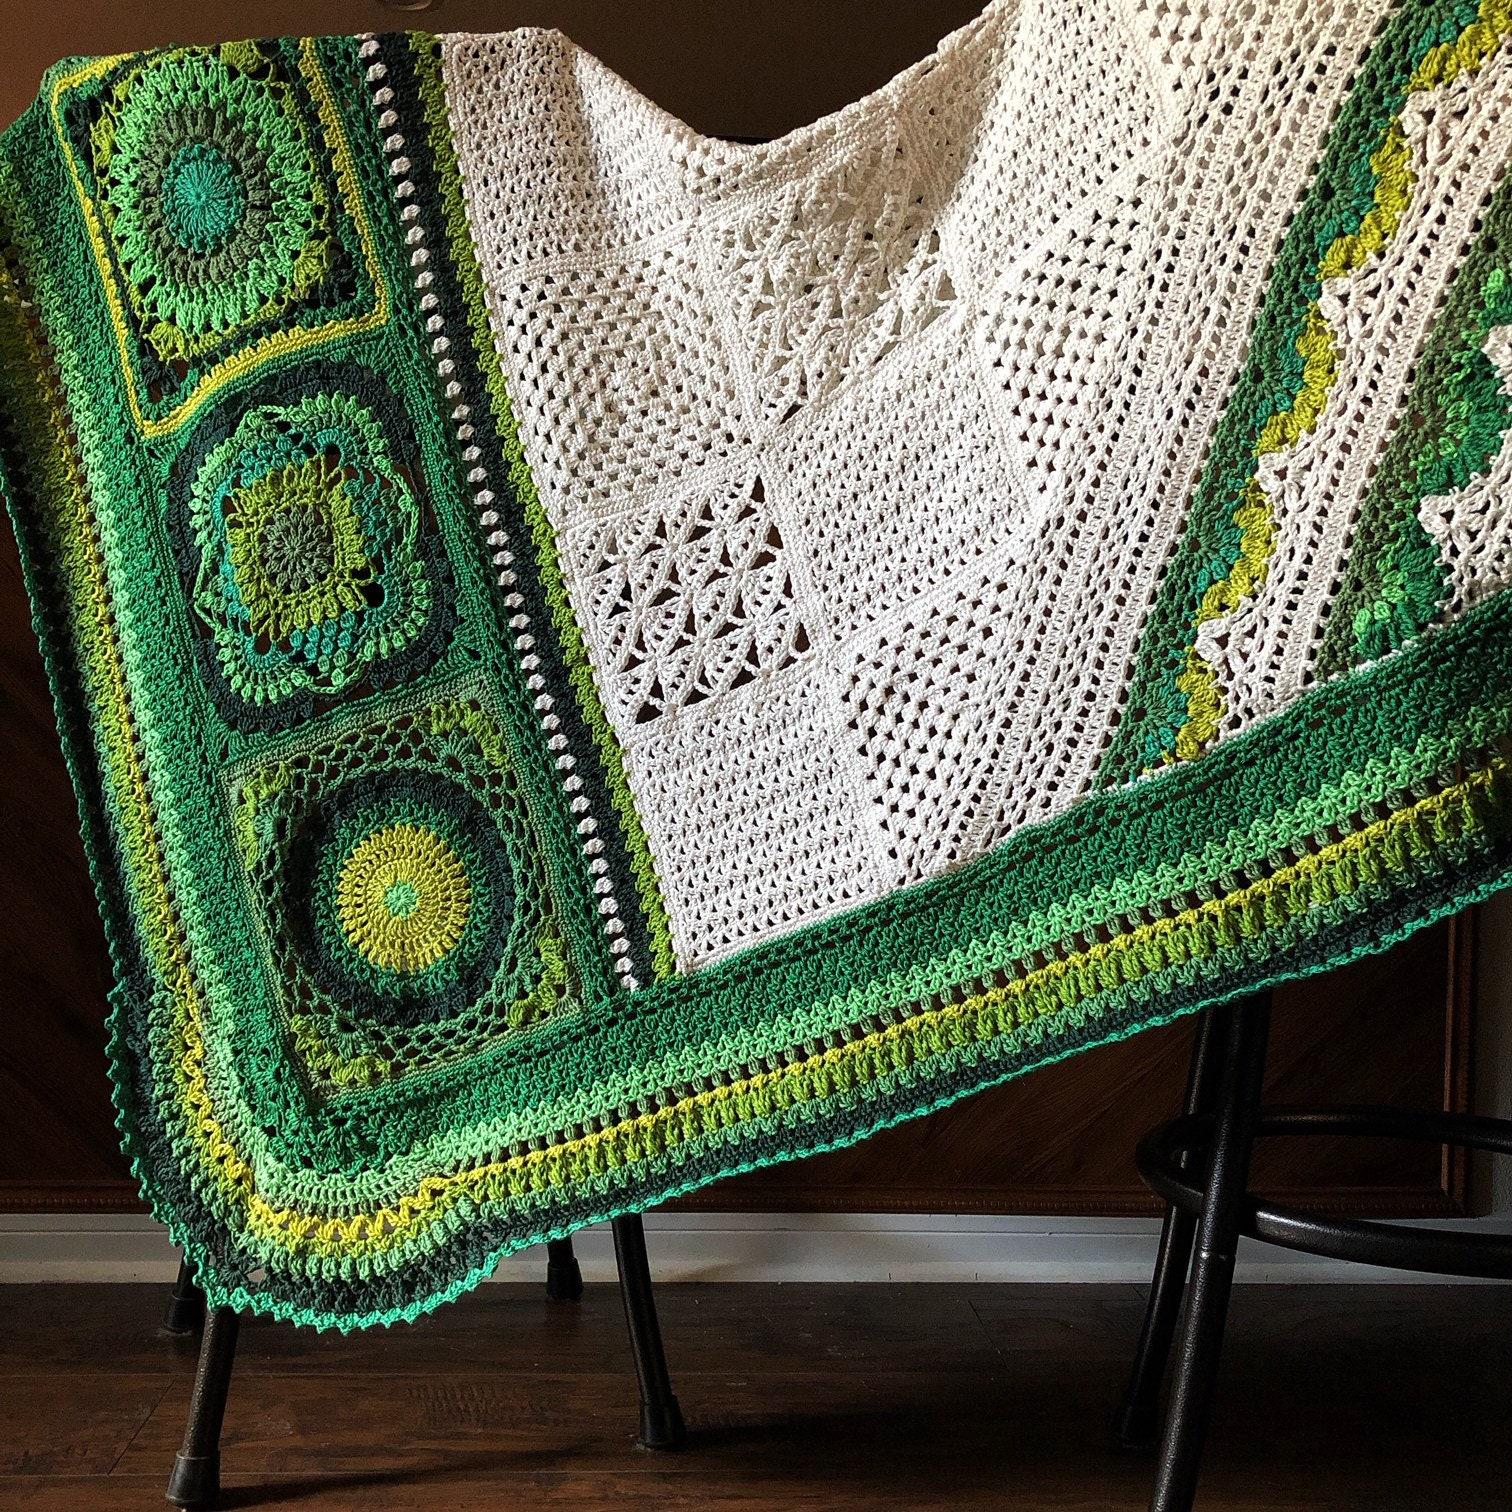 Crochet Wedding Gift Patterns: BOTANICA CROCHET Patterns/crochet Baby Blanket/wedding